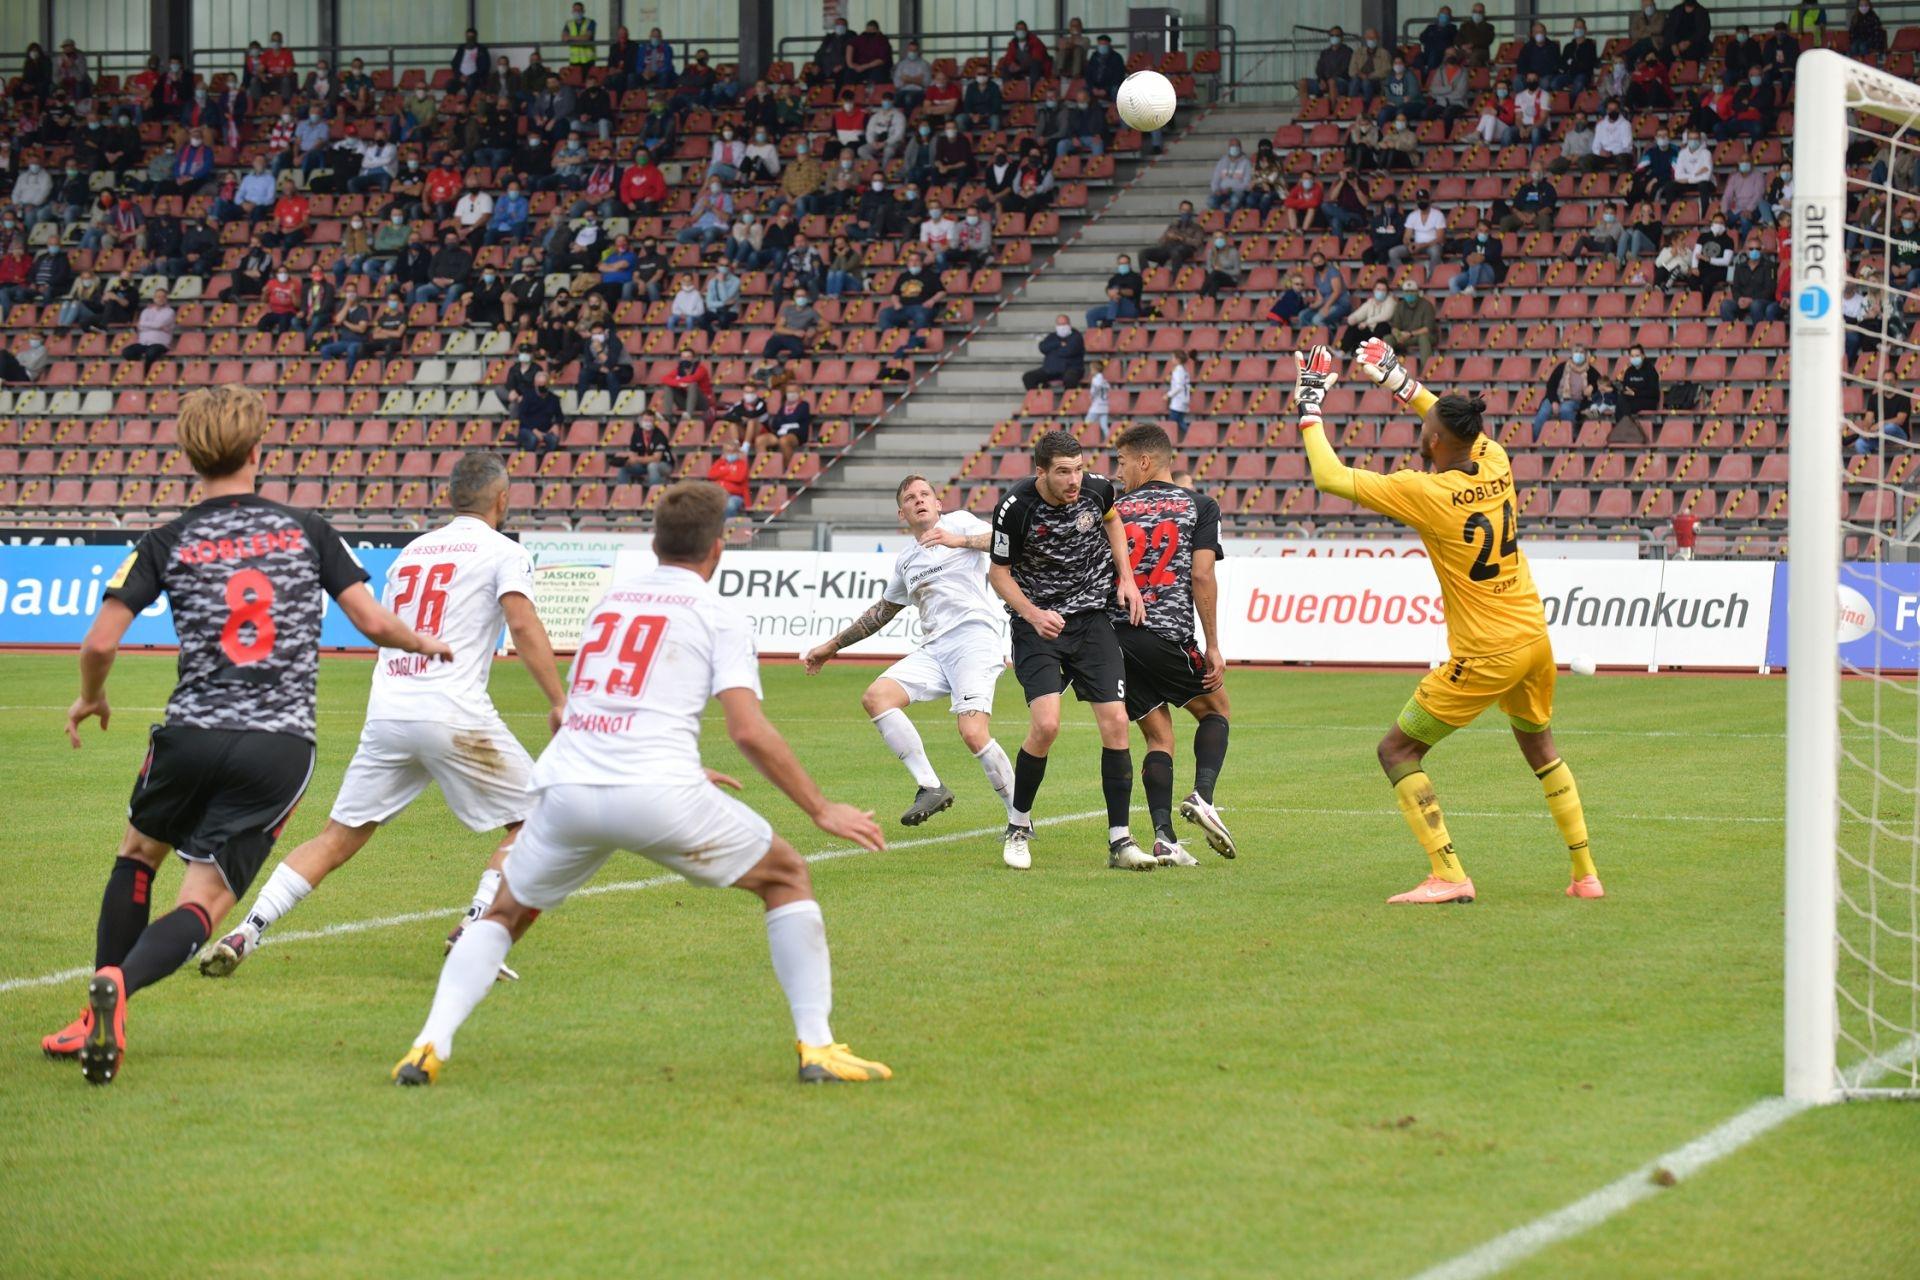 Regionalliga S�dwest 2020/21, KSV Hessen Kassel, Rot-Weiss-Koblenz, Endstand 1:1